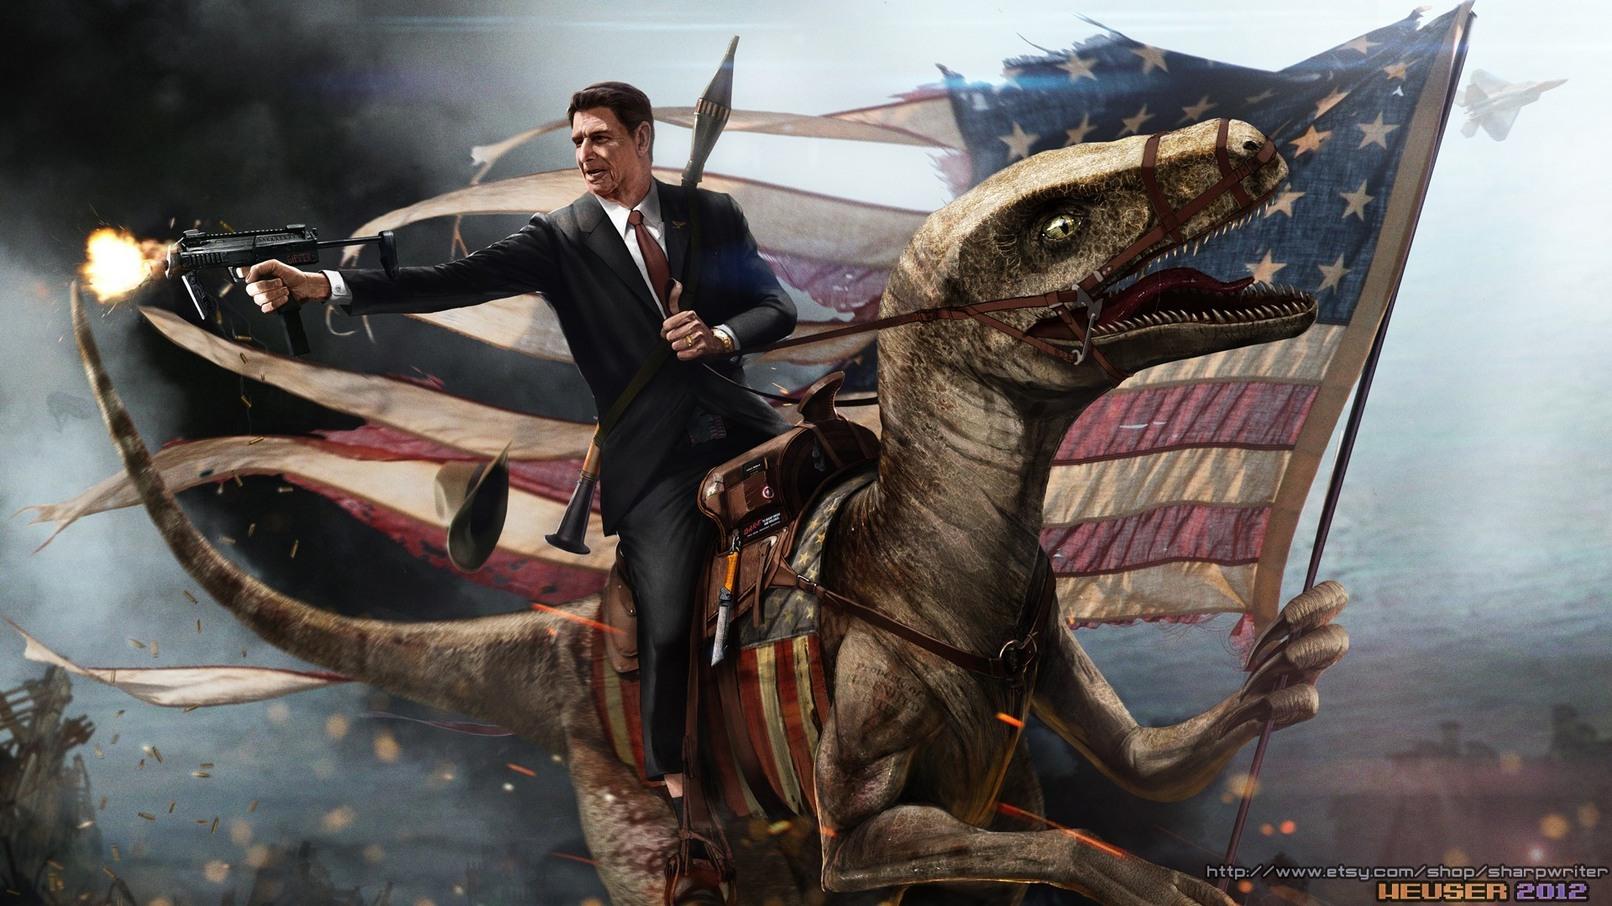 Reptile america - meme